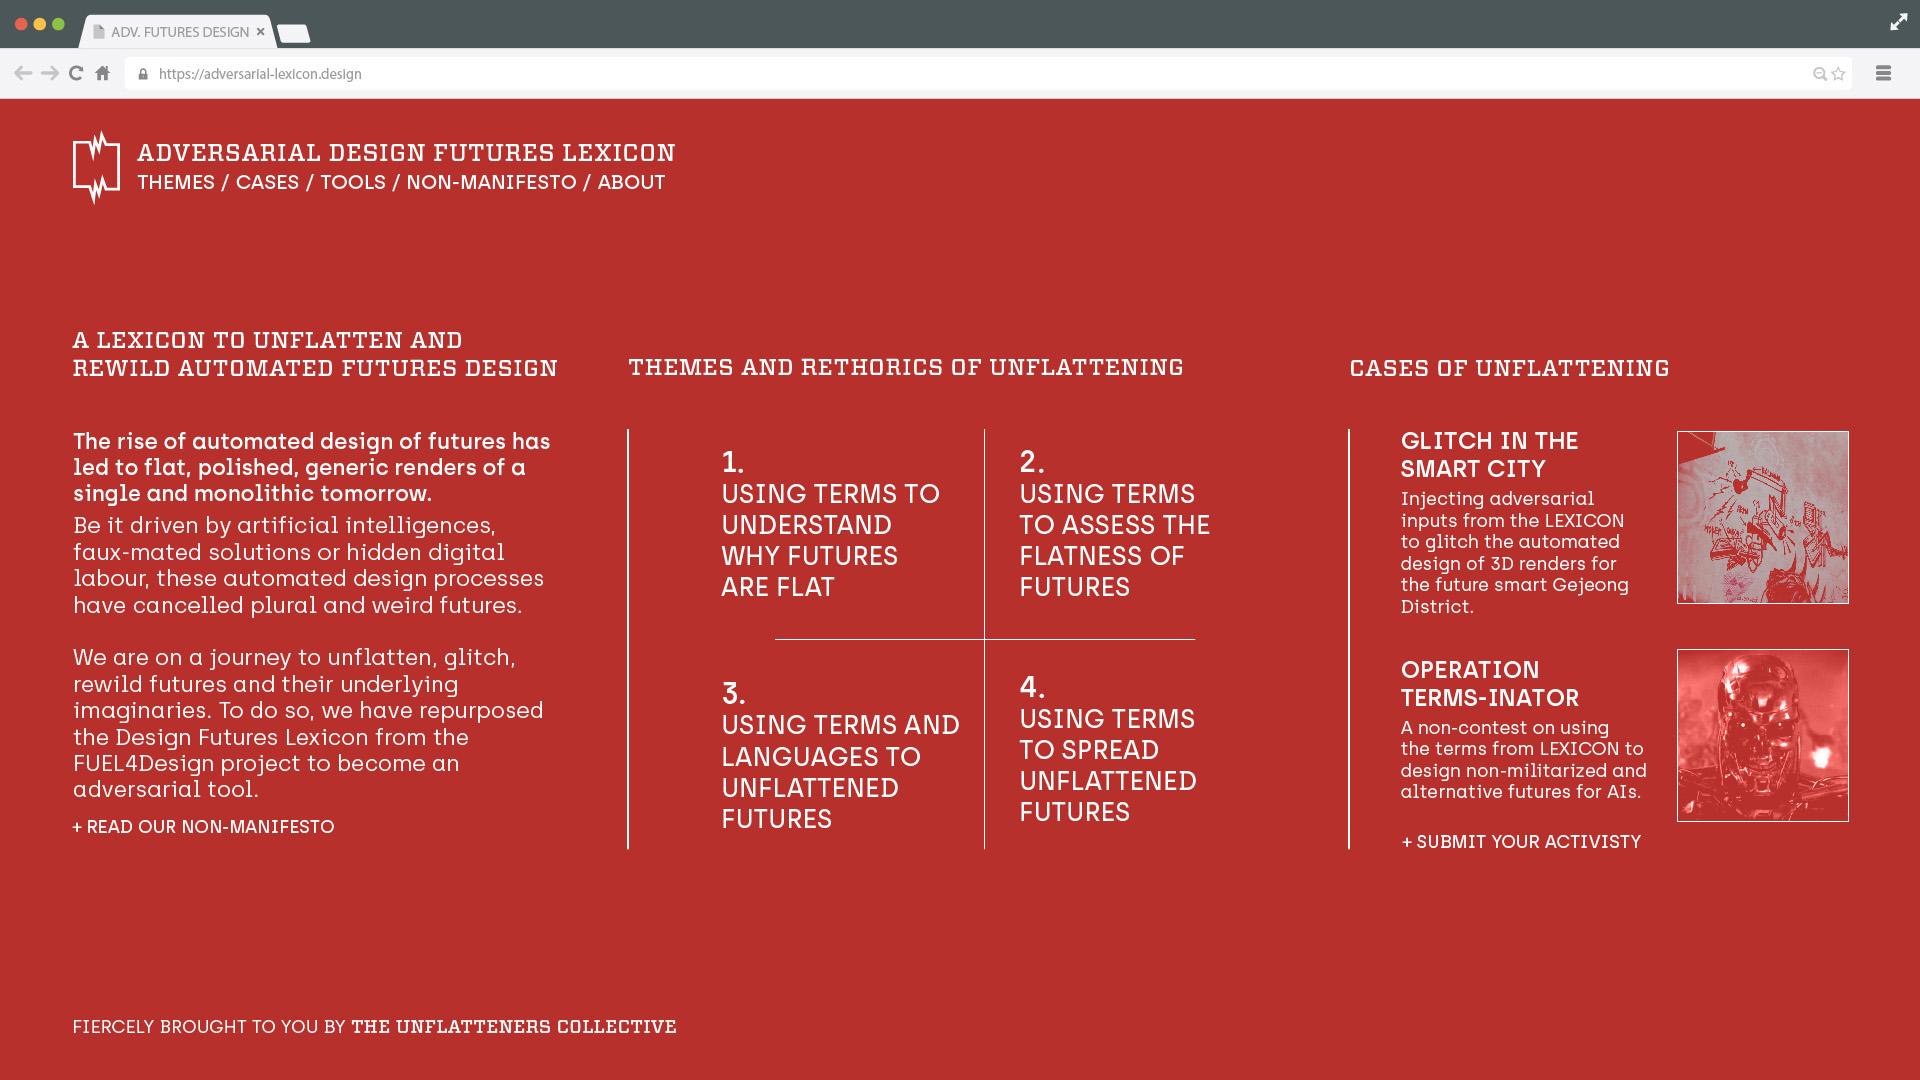 The Adversarial Design Futures Lexicon webpage